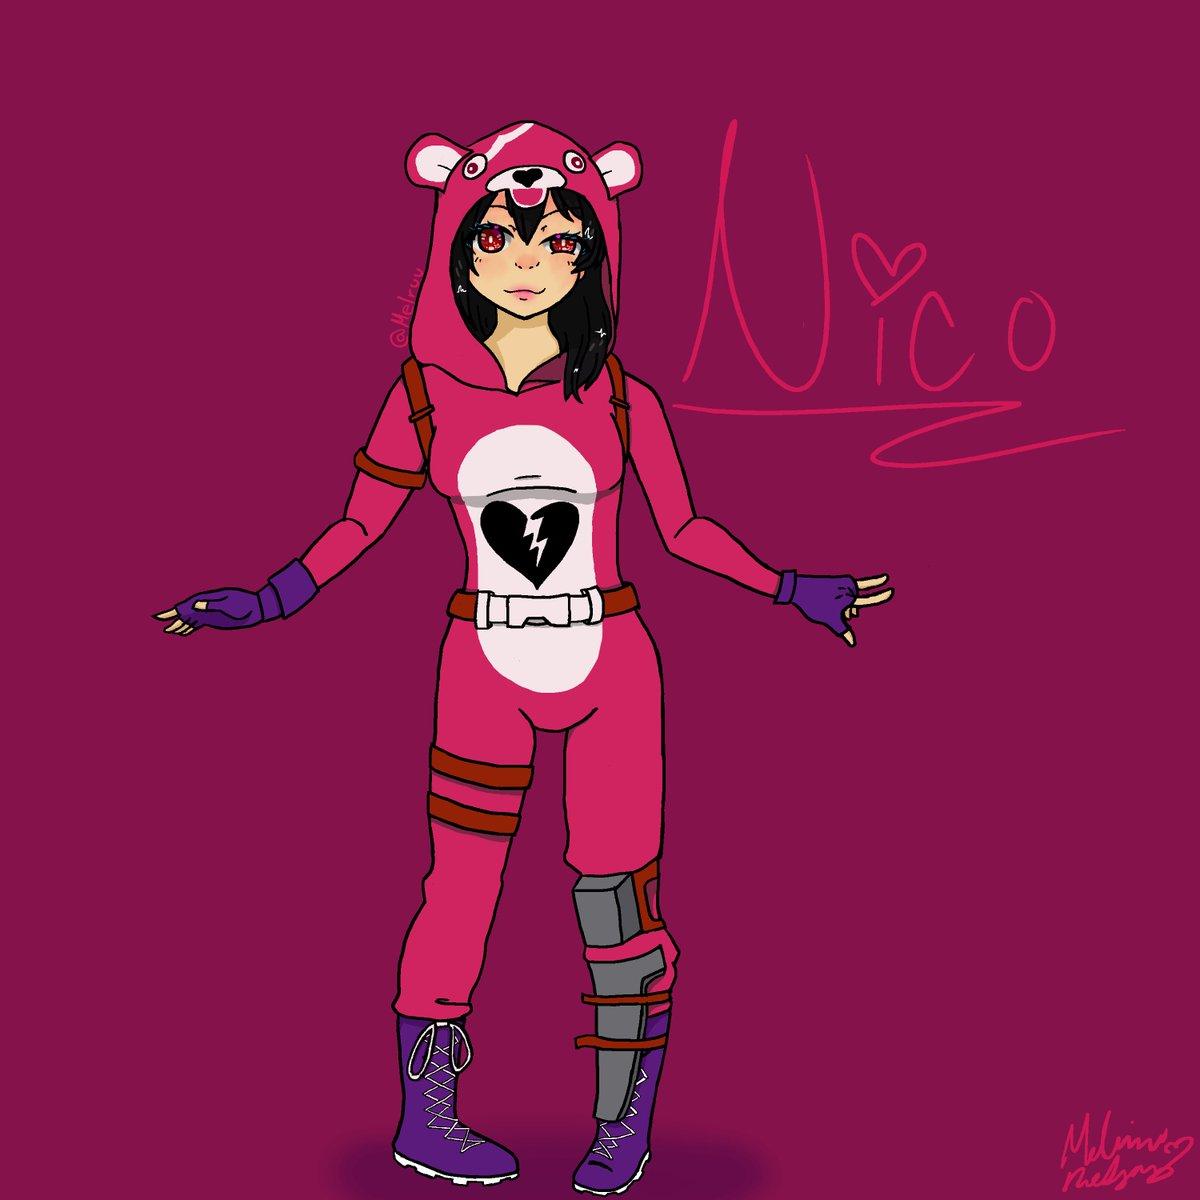 Nico Yazawa x Cuddle Team Leader for @SmugZebra #LoveLive #Fortnite <br>http://pic.twitter.com/FeIiOLgYnf